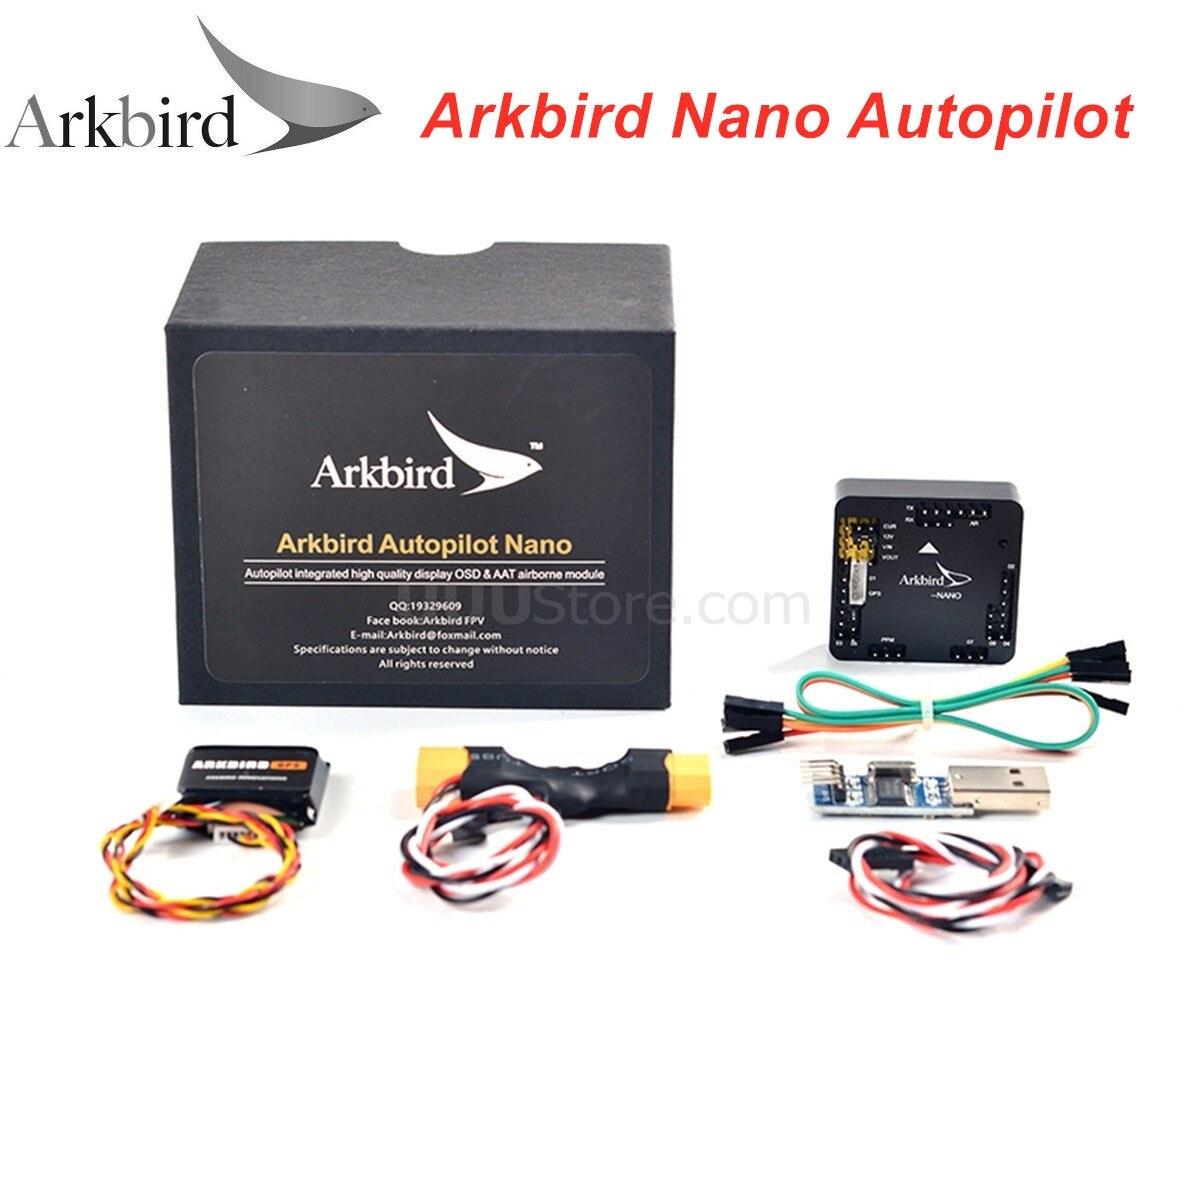 Nano piloto automático Arkbird, Control de vuelo extremo pequeño, 15,2g, OSD ATT para Drones de carreras RC, Mini aviones FPV